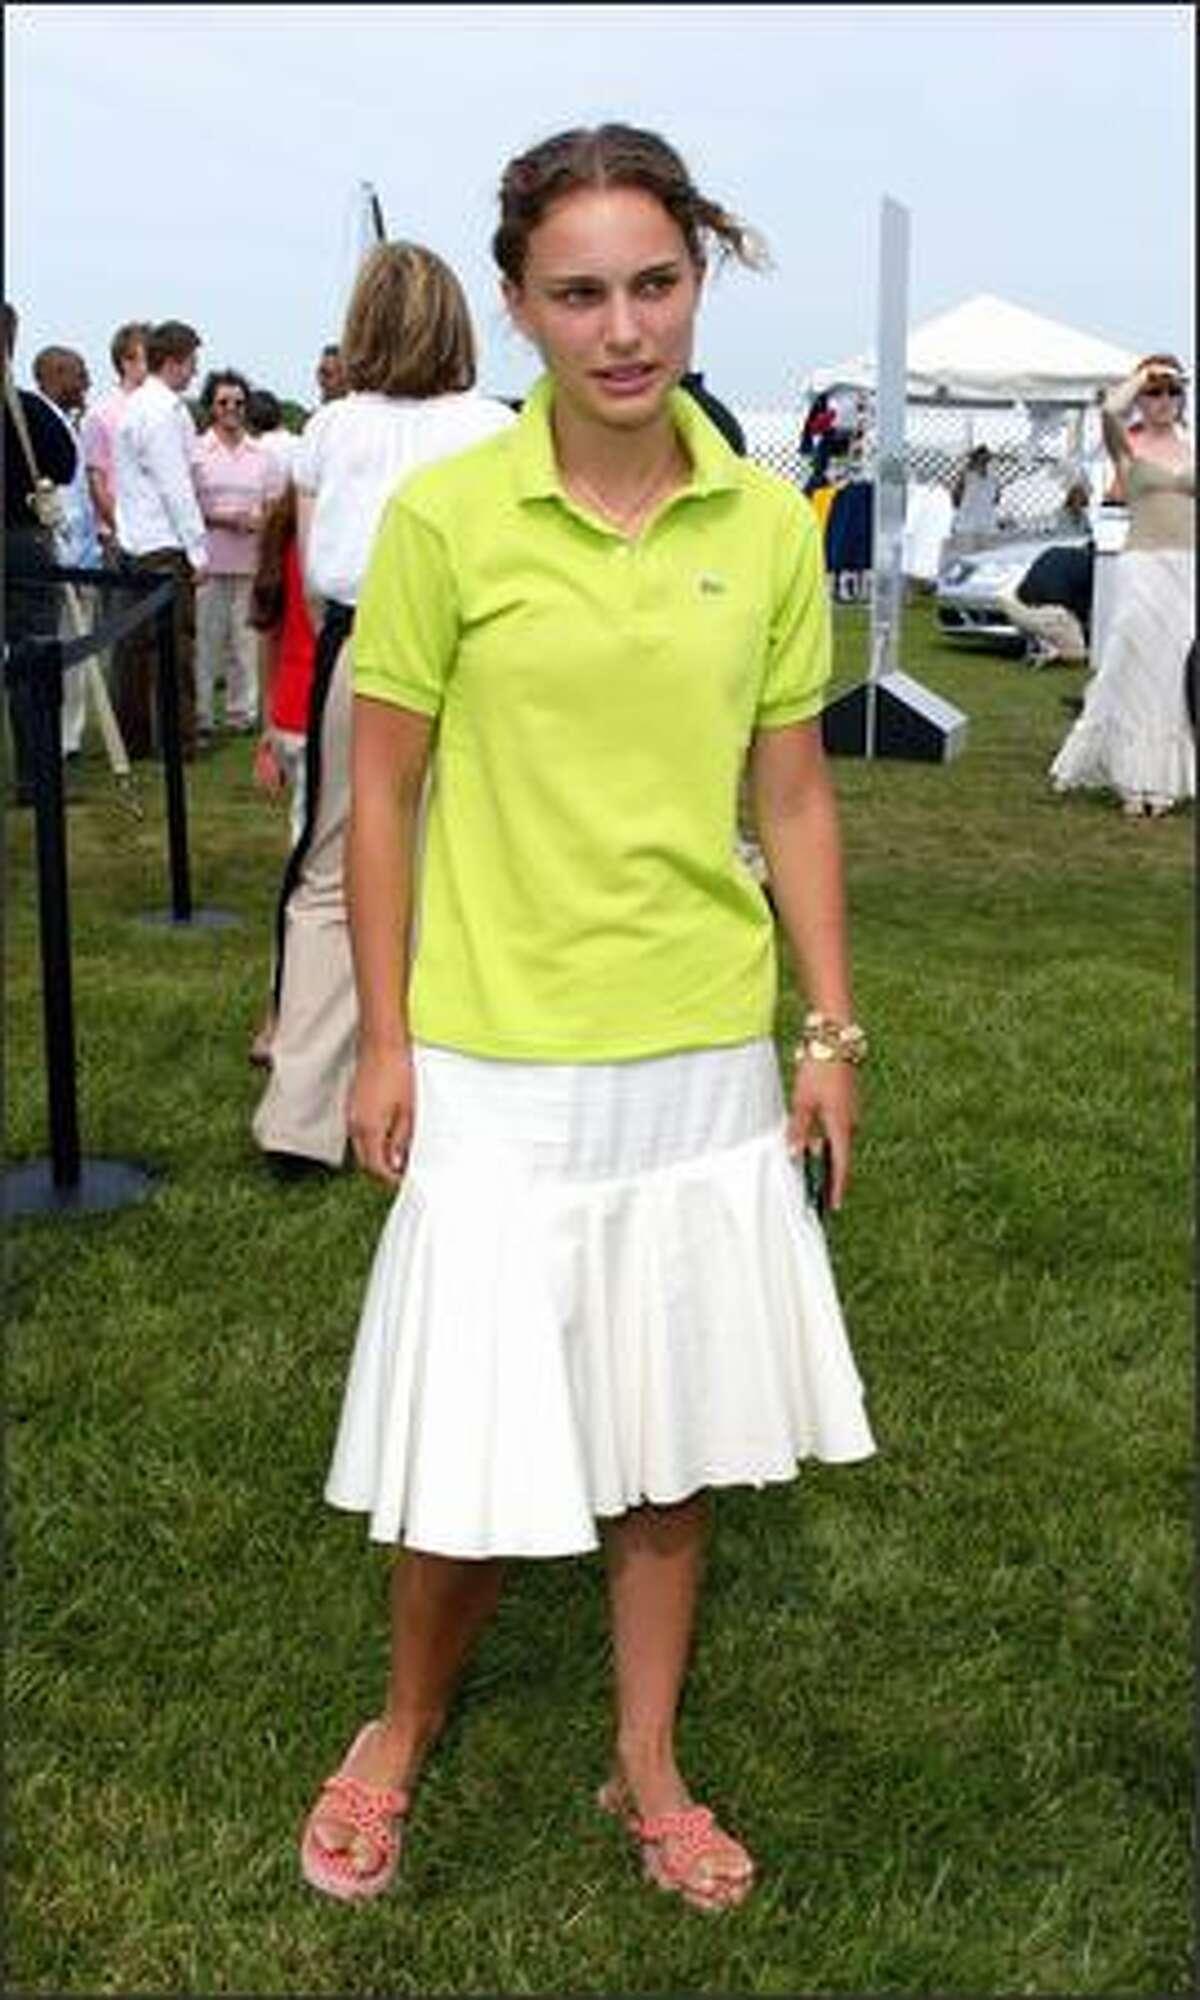 Natalie Portman attends the Mercedes-Benz Polo Challenge in Bridgehampton, N.Y., July 13, 2002.